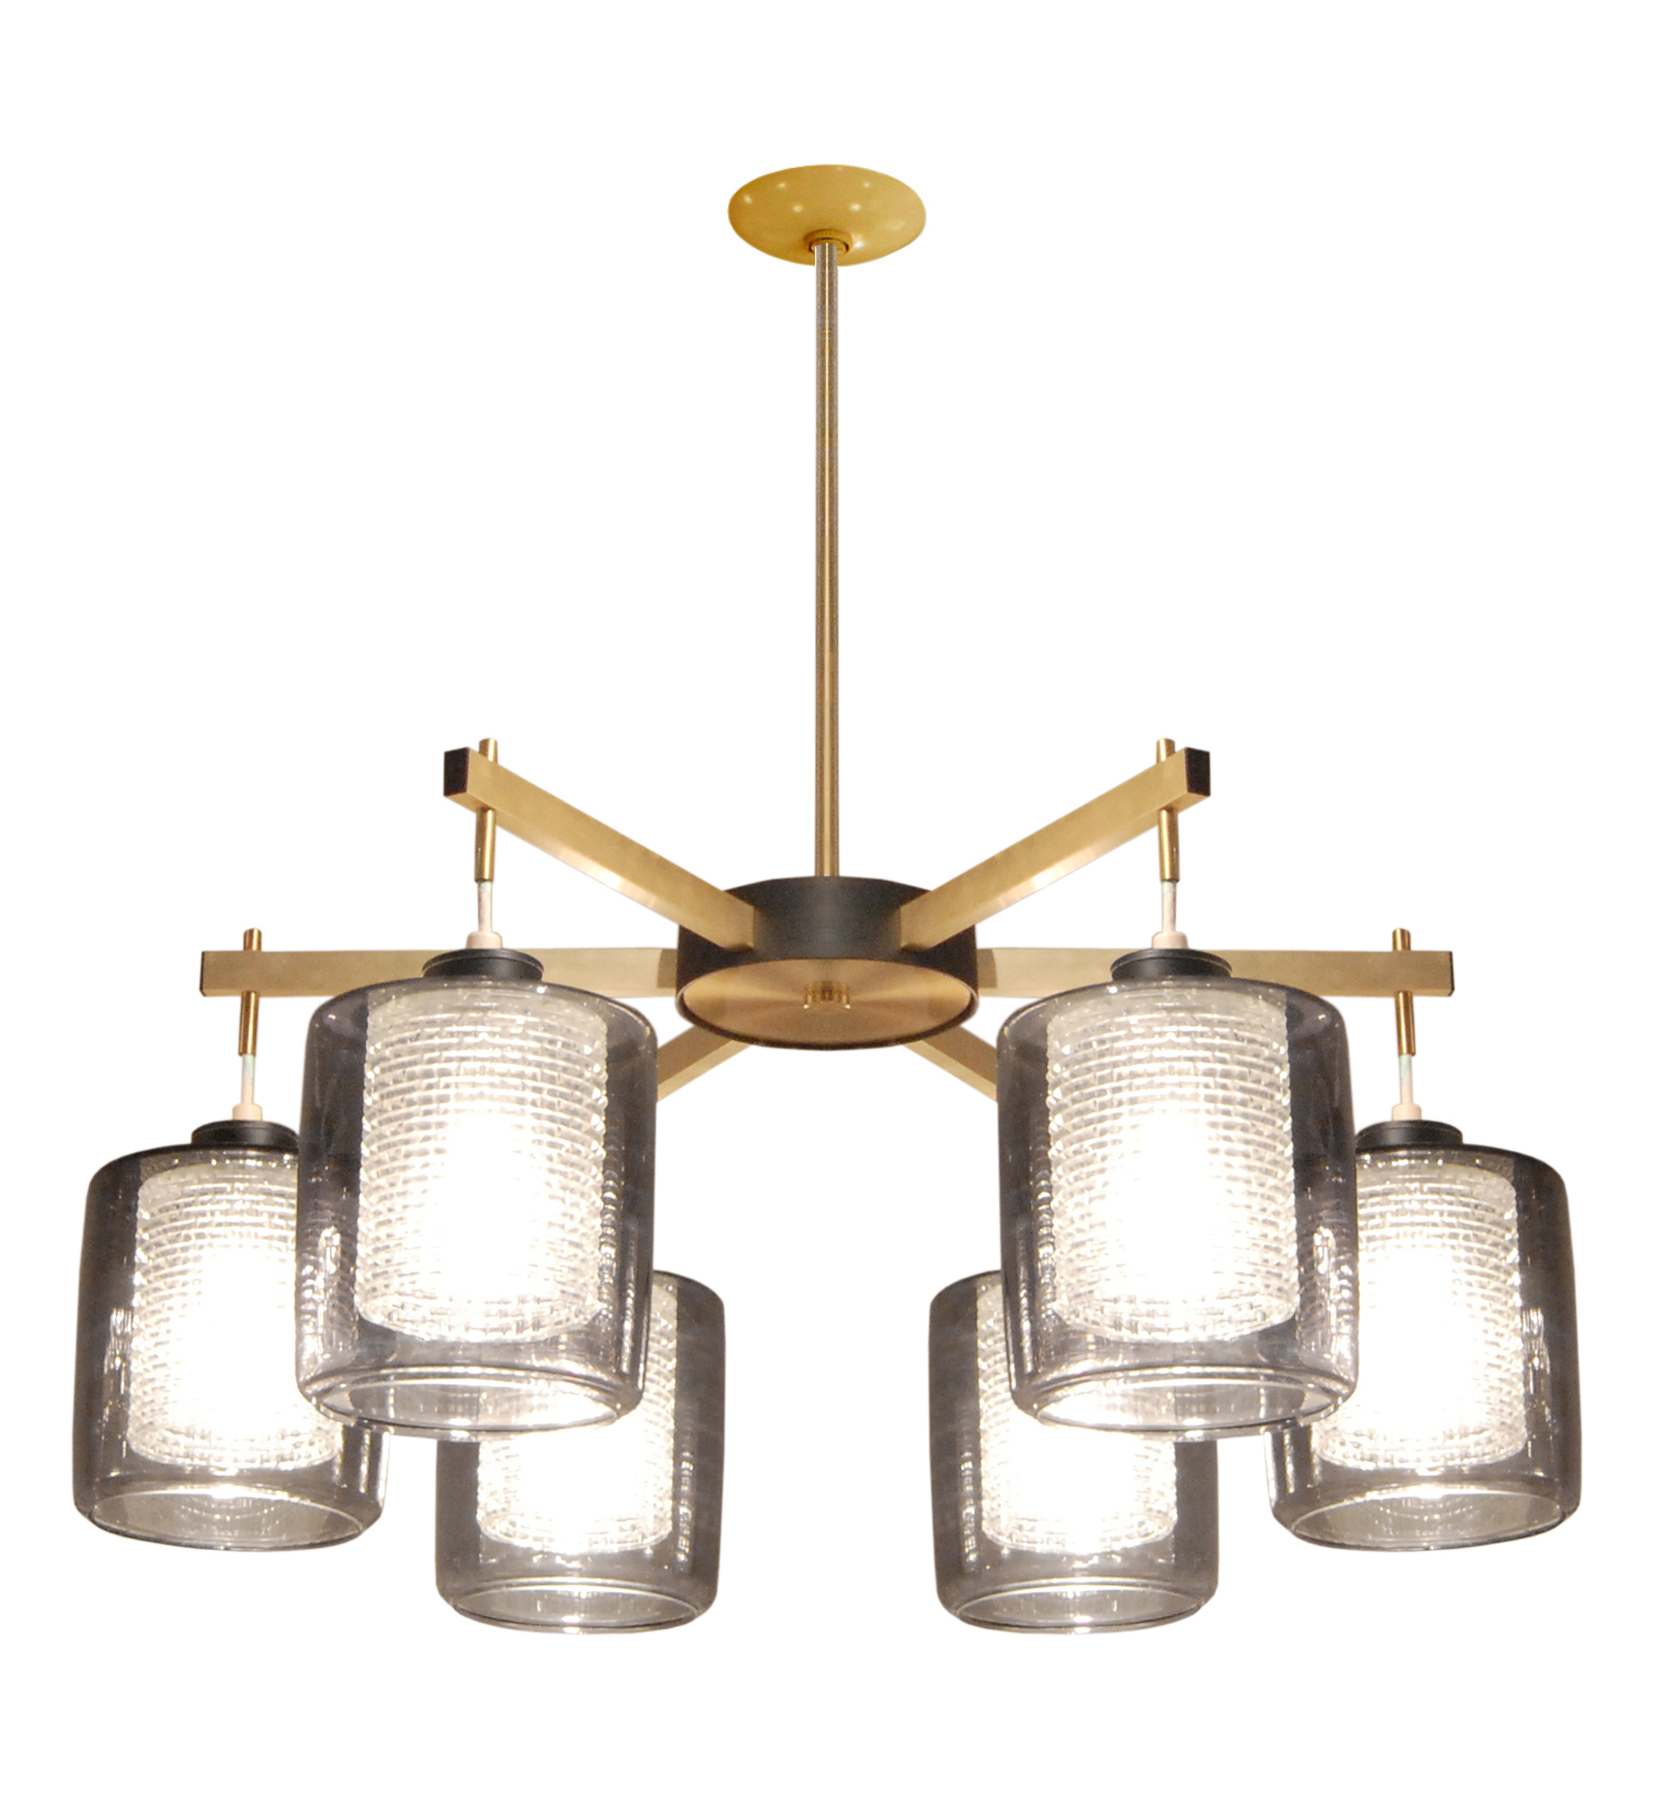 50's 45 Lrg rnd 6 glass shadesbrass chandelier157 hires.jpg